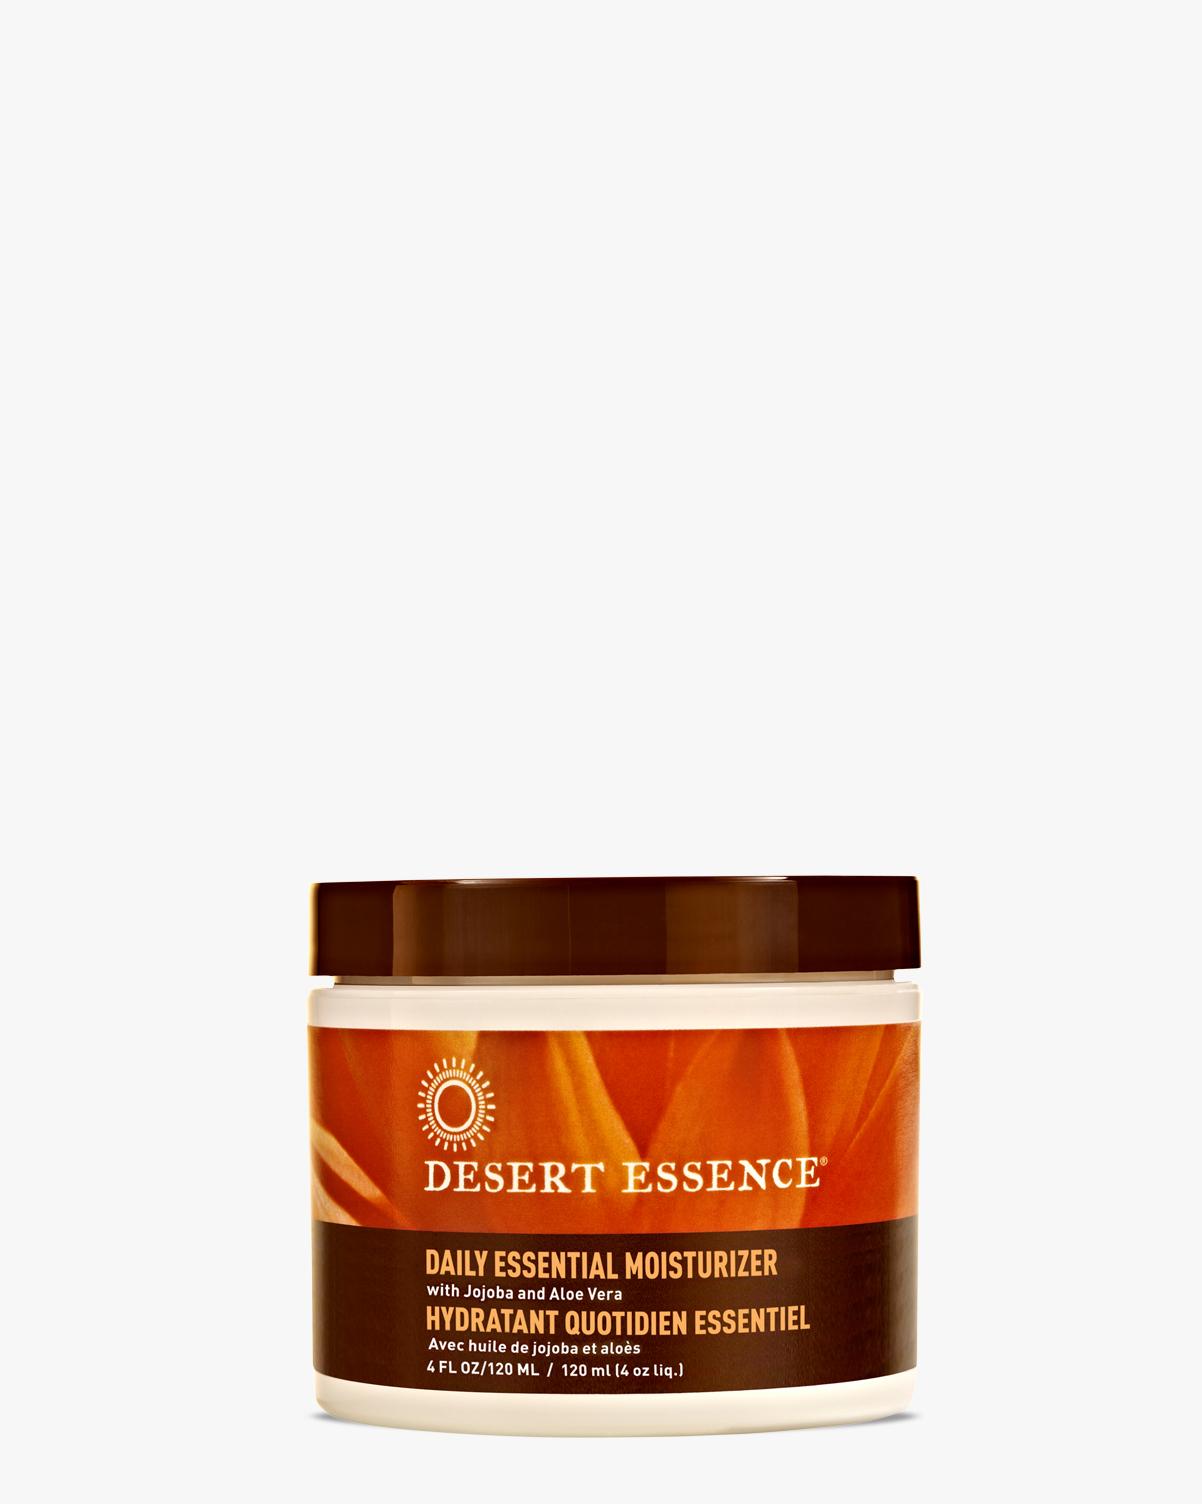 Desert Essence coupon: Desert Essence Daily Essential Moisturizer, 4 fl. oz. | Vegan | Gluten-Free